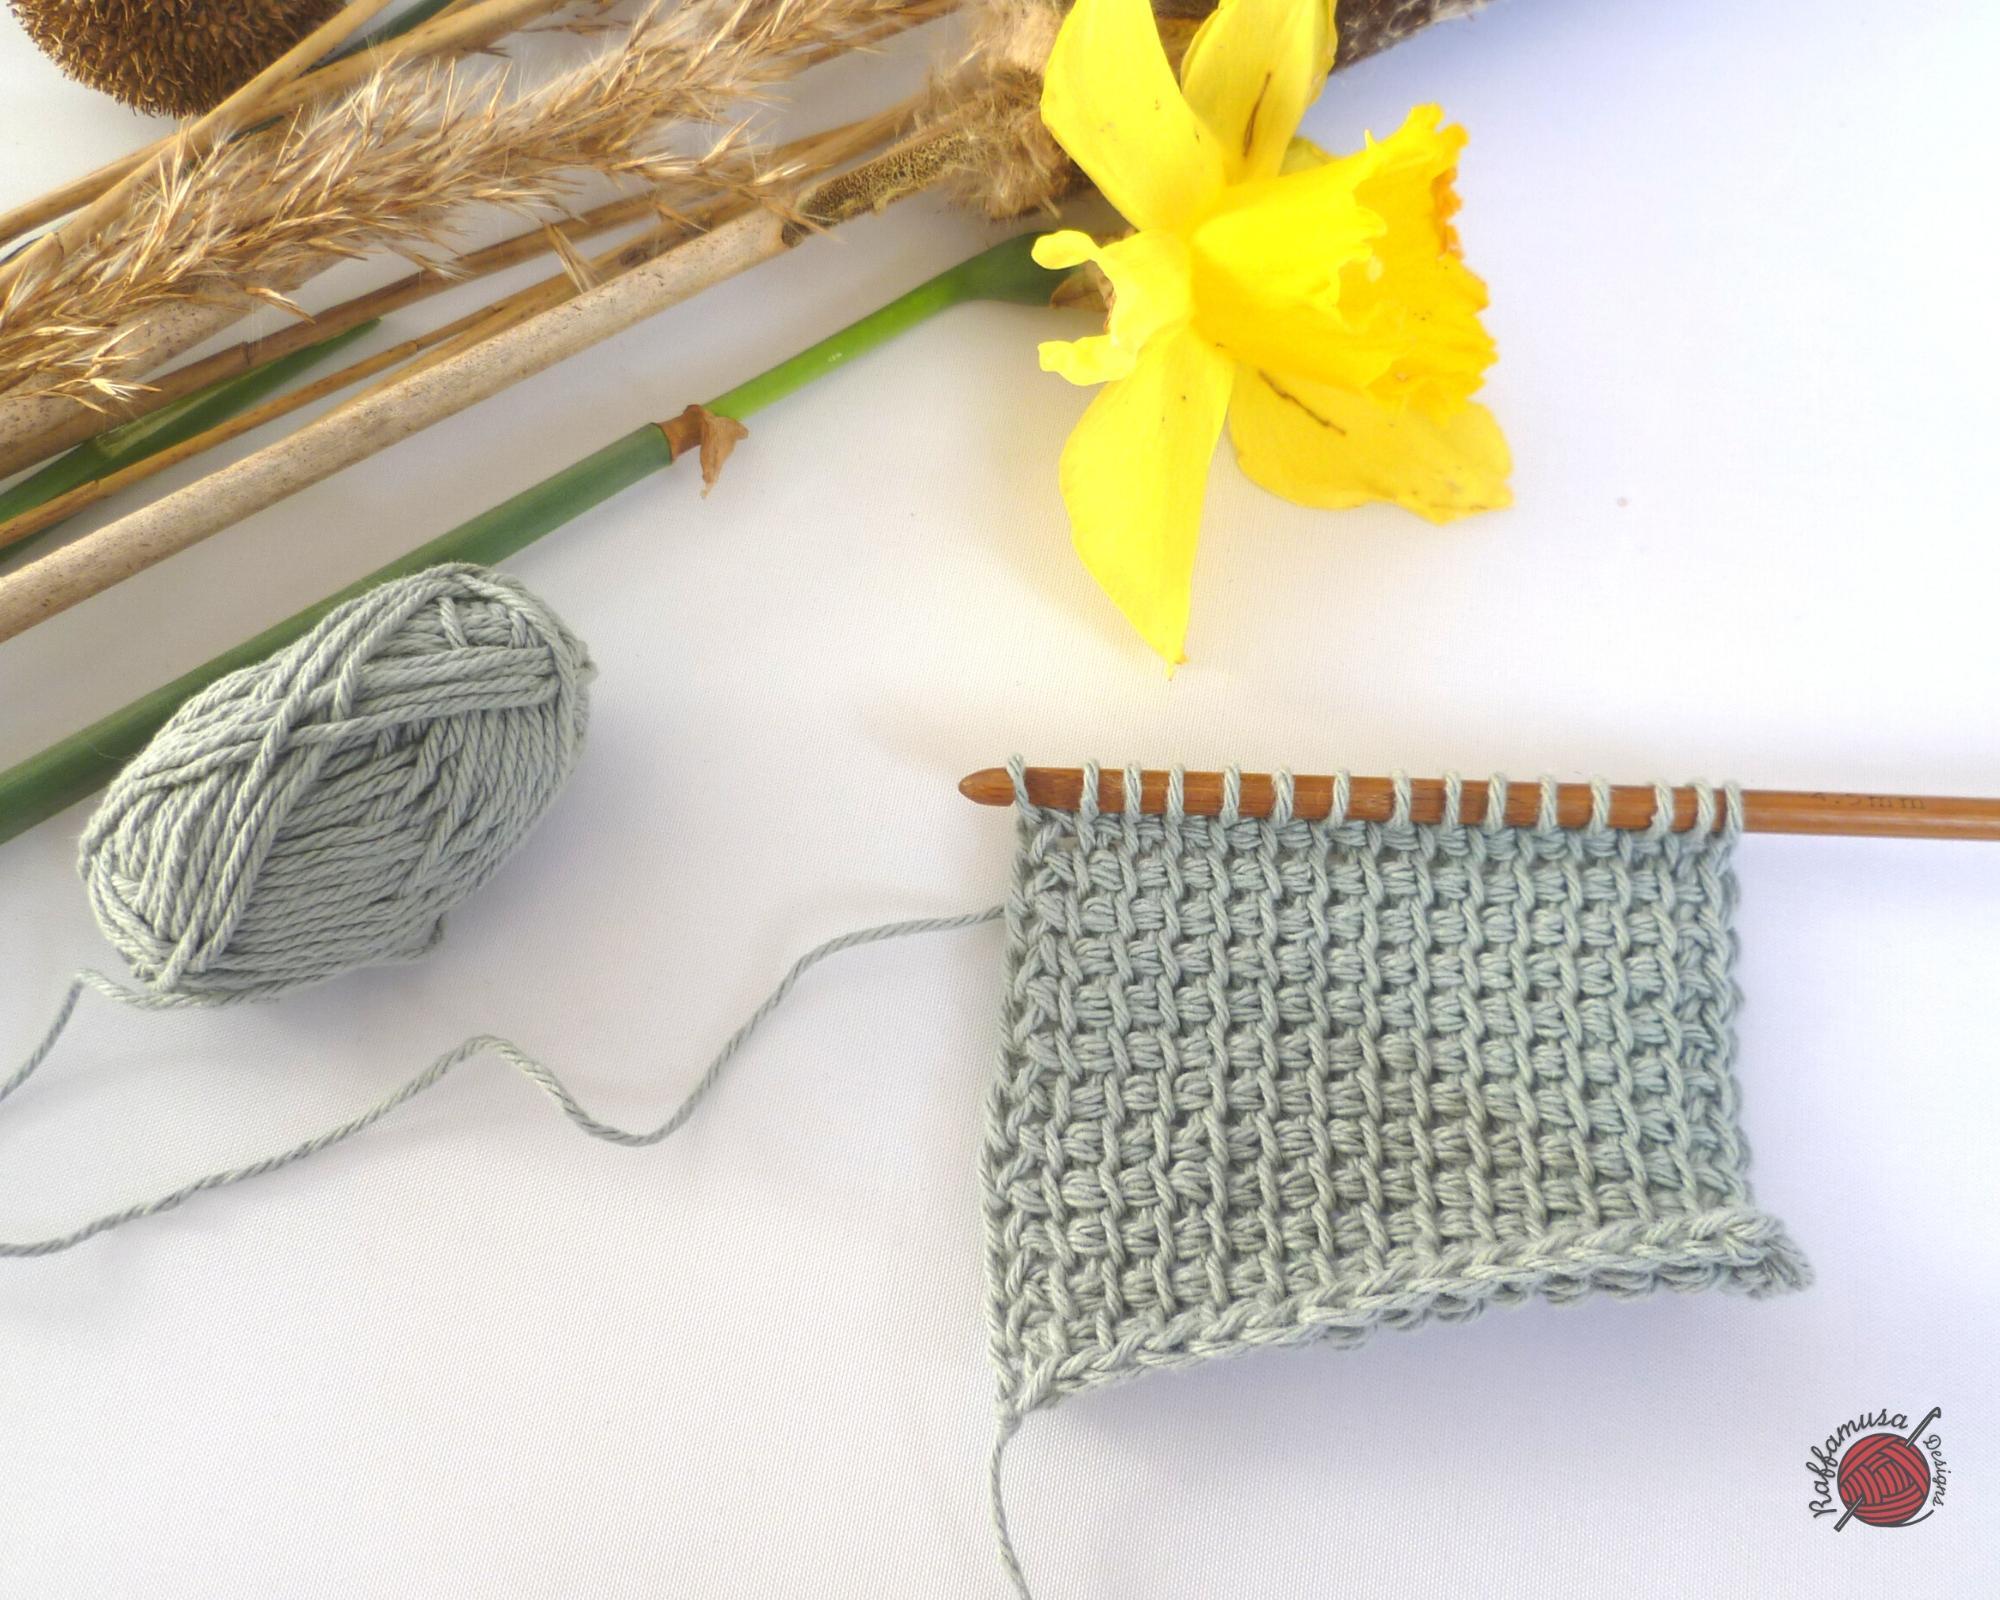 Tunisian Crochet Simple Stitch - Free Tutorial by RaffamusaDesigns